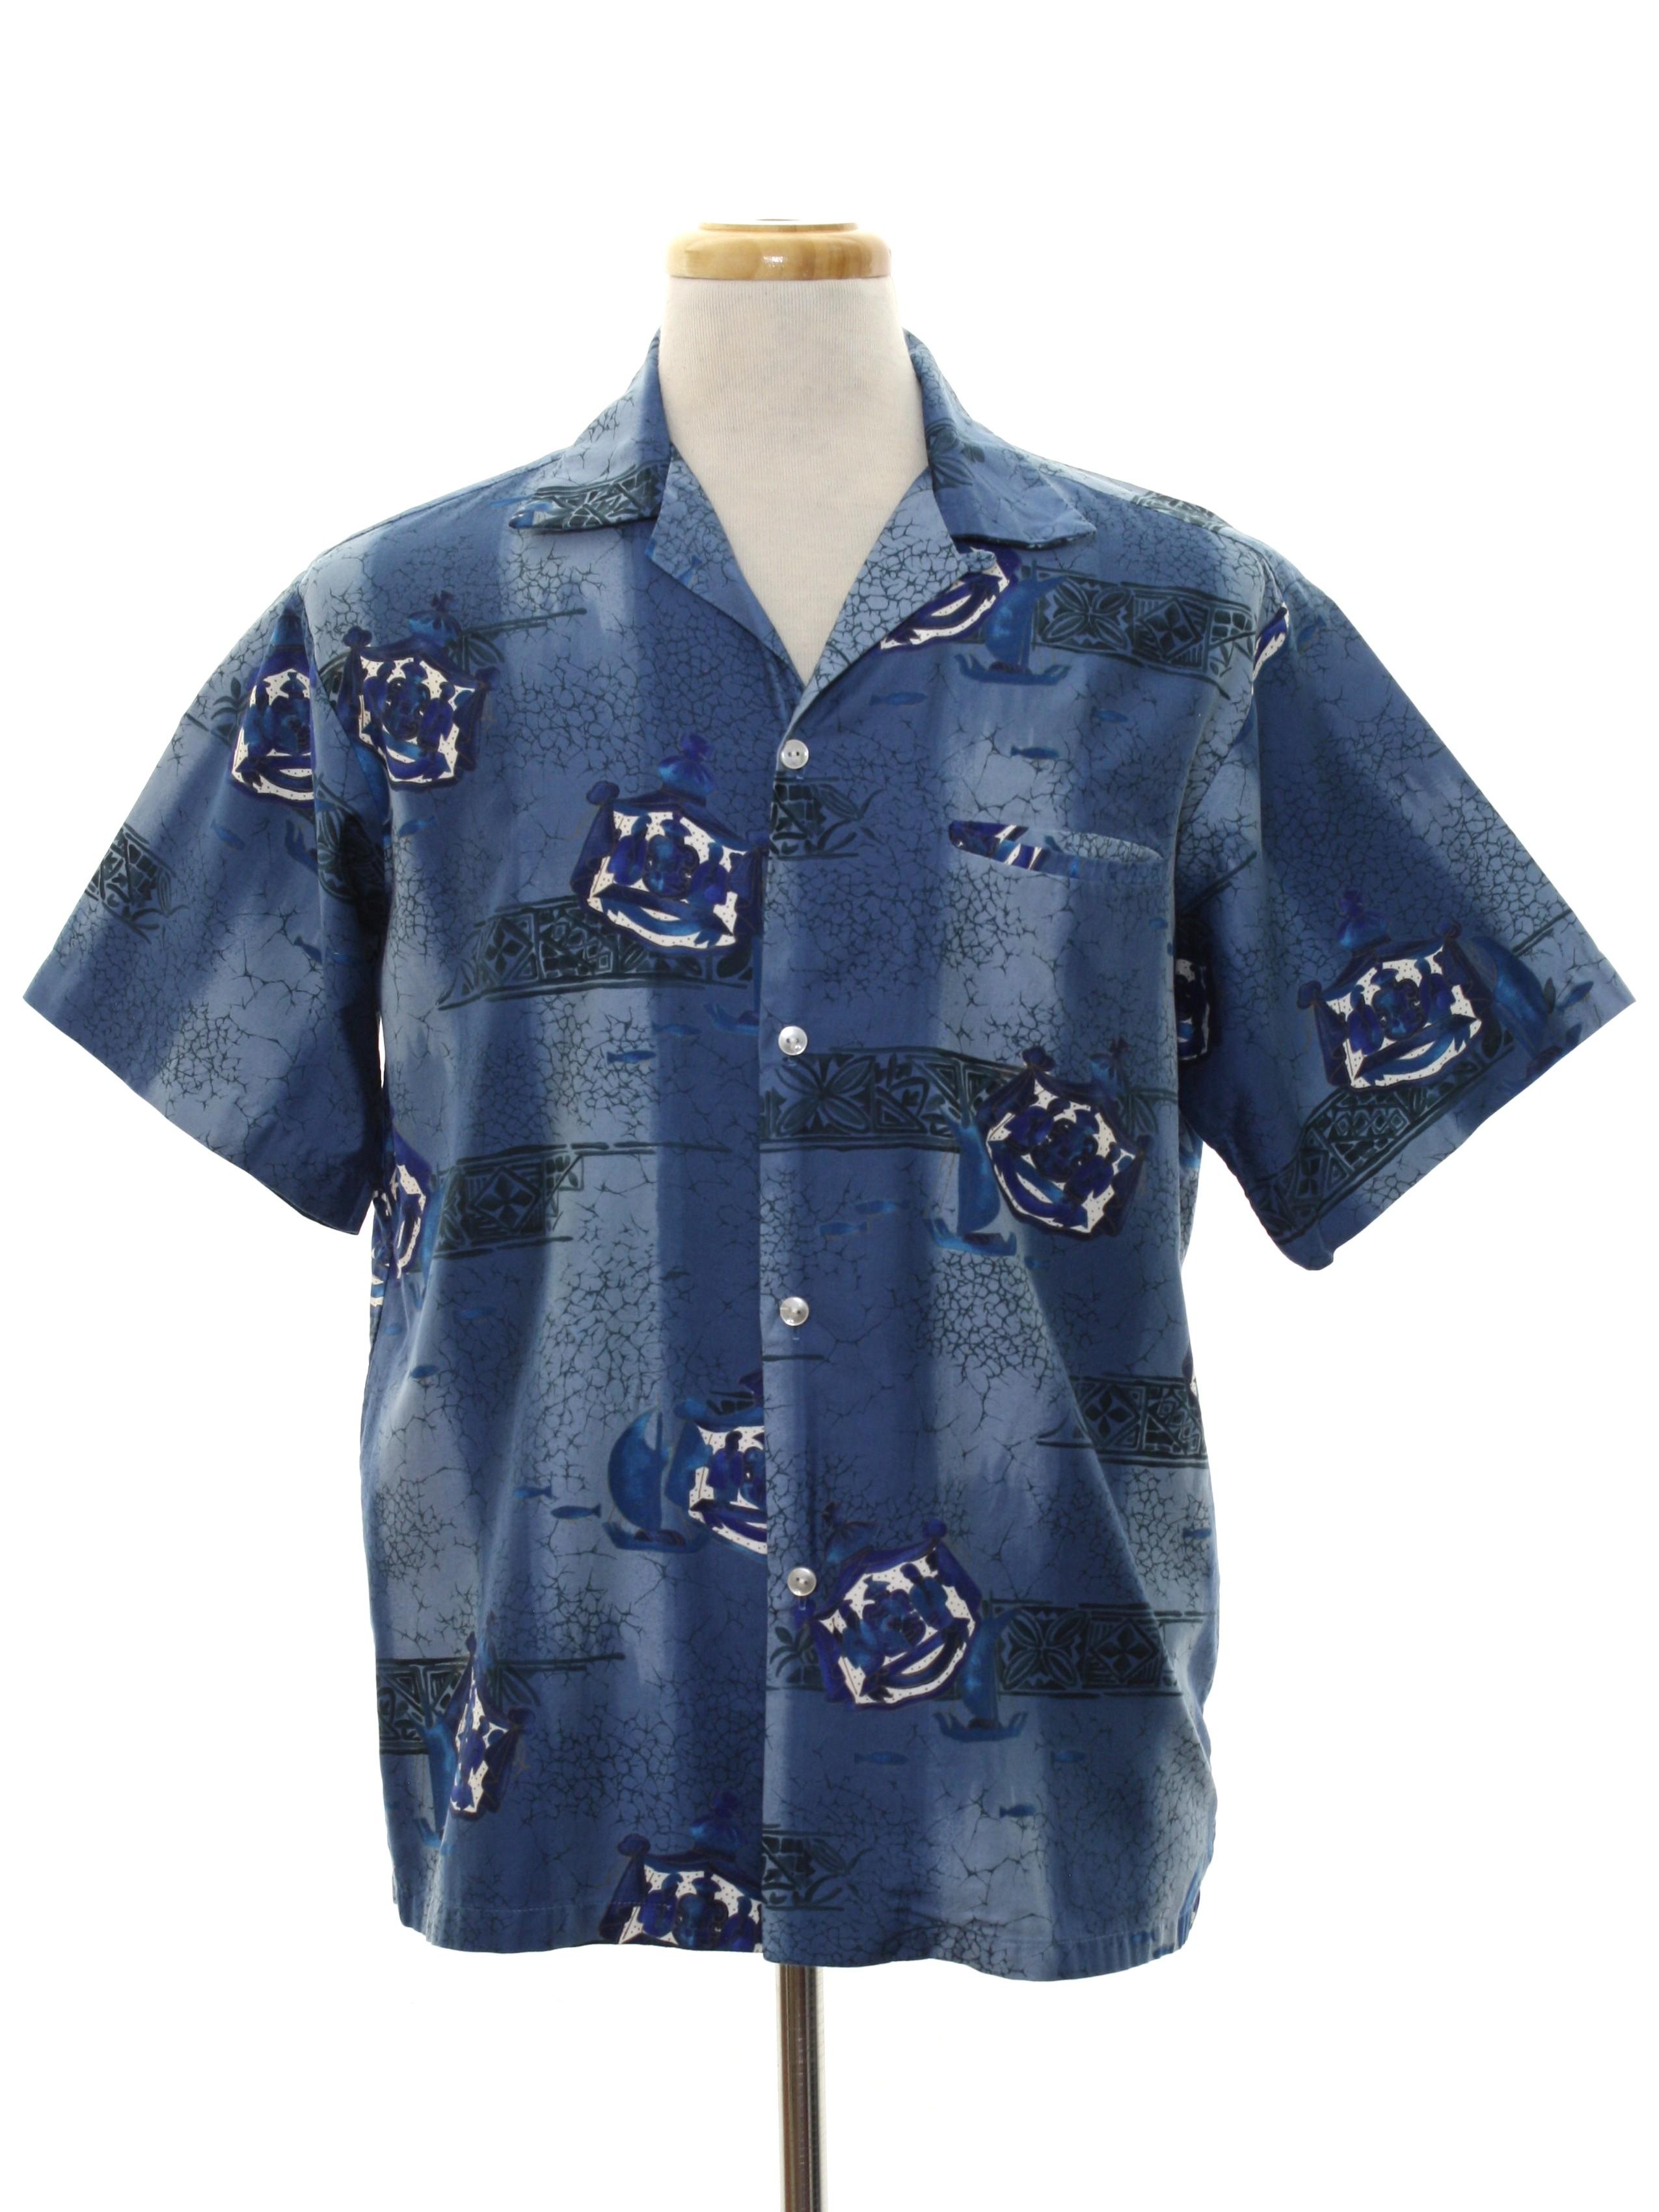 1244d4e1 Tropicana Made in Honolulu 1960s Vintage Hawaiian Shirt: Early 60s ...